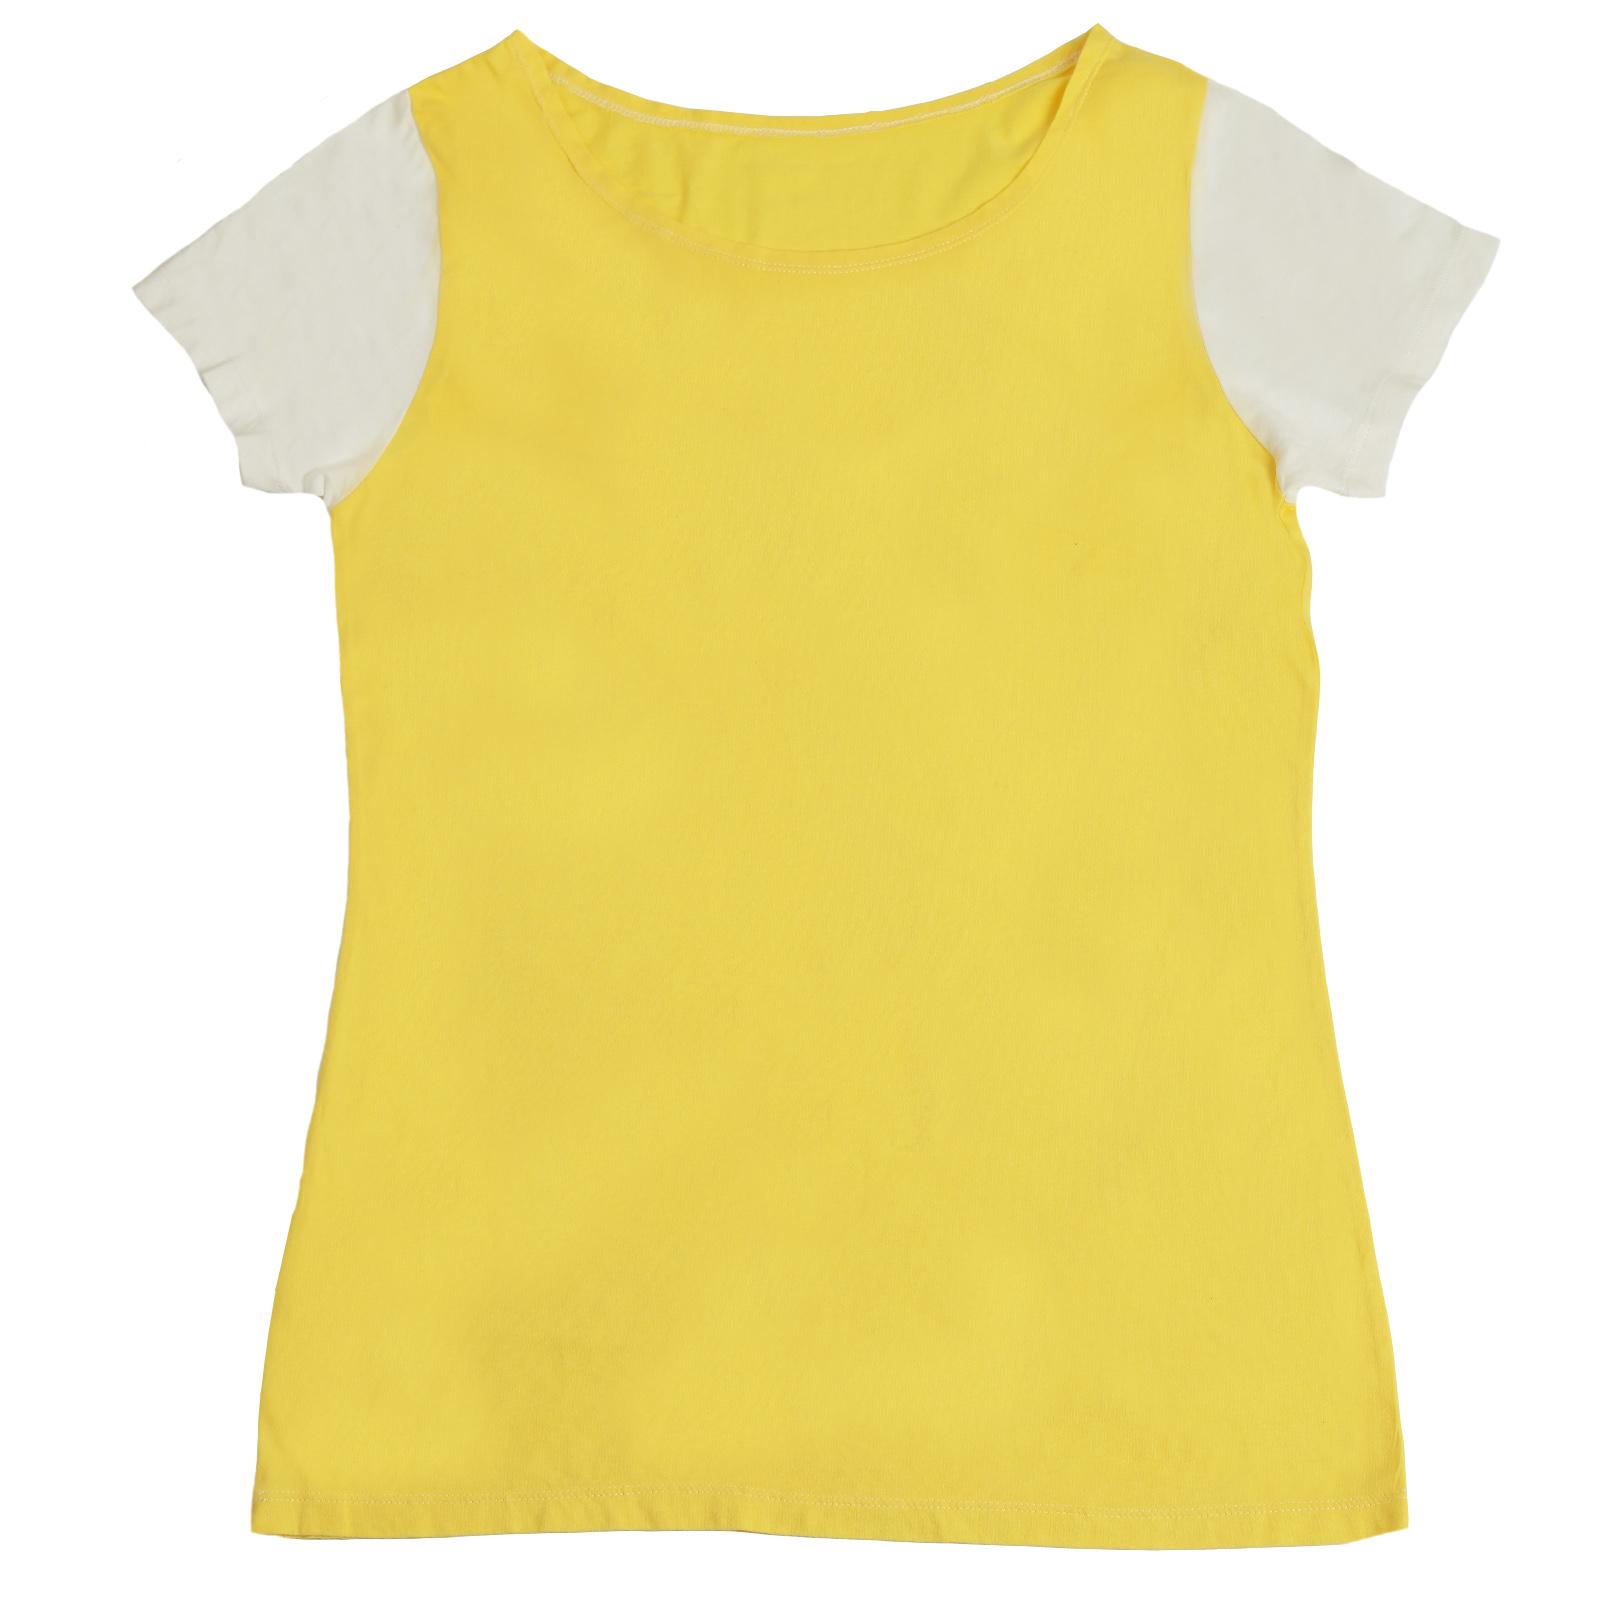 Летняя женская футболка для приятного отдыха на даче